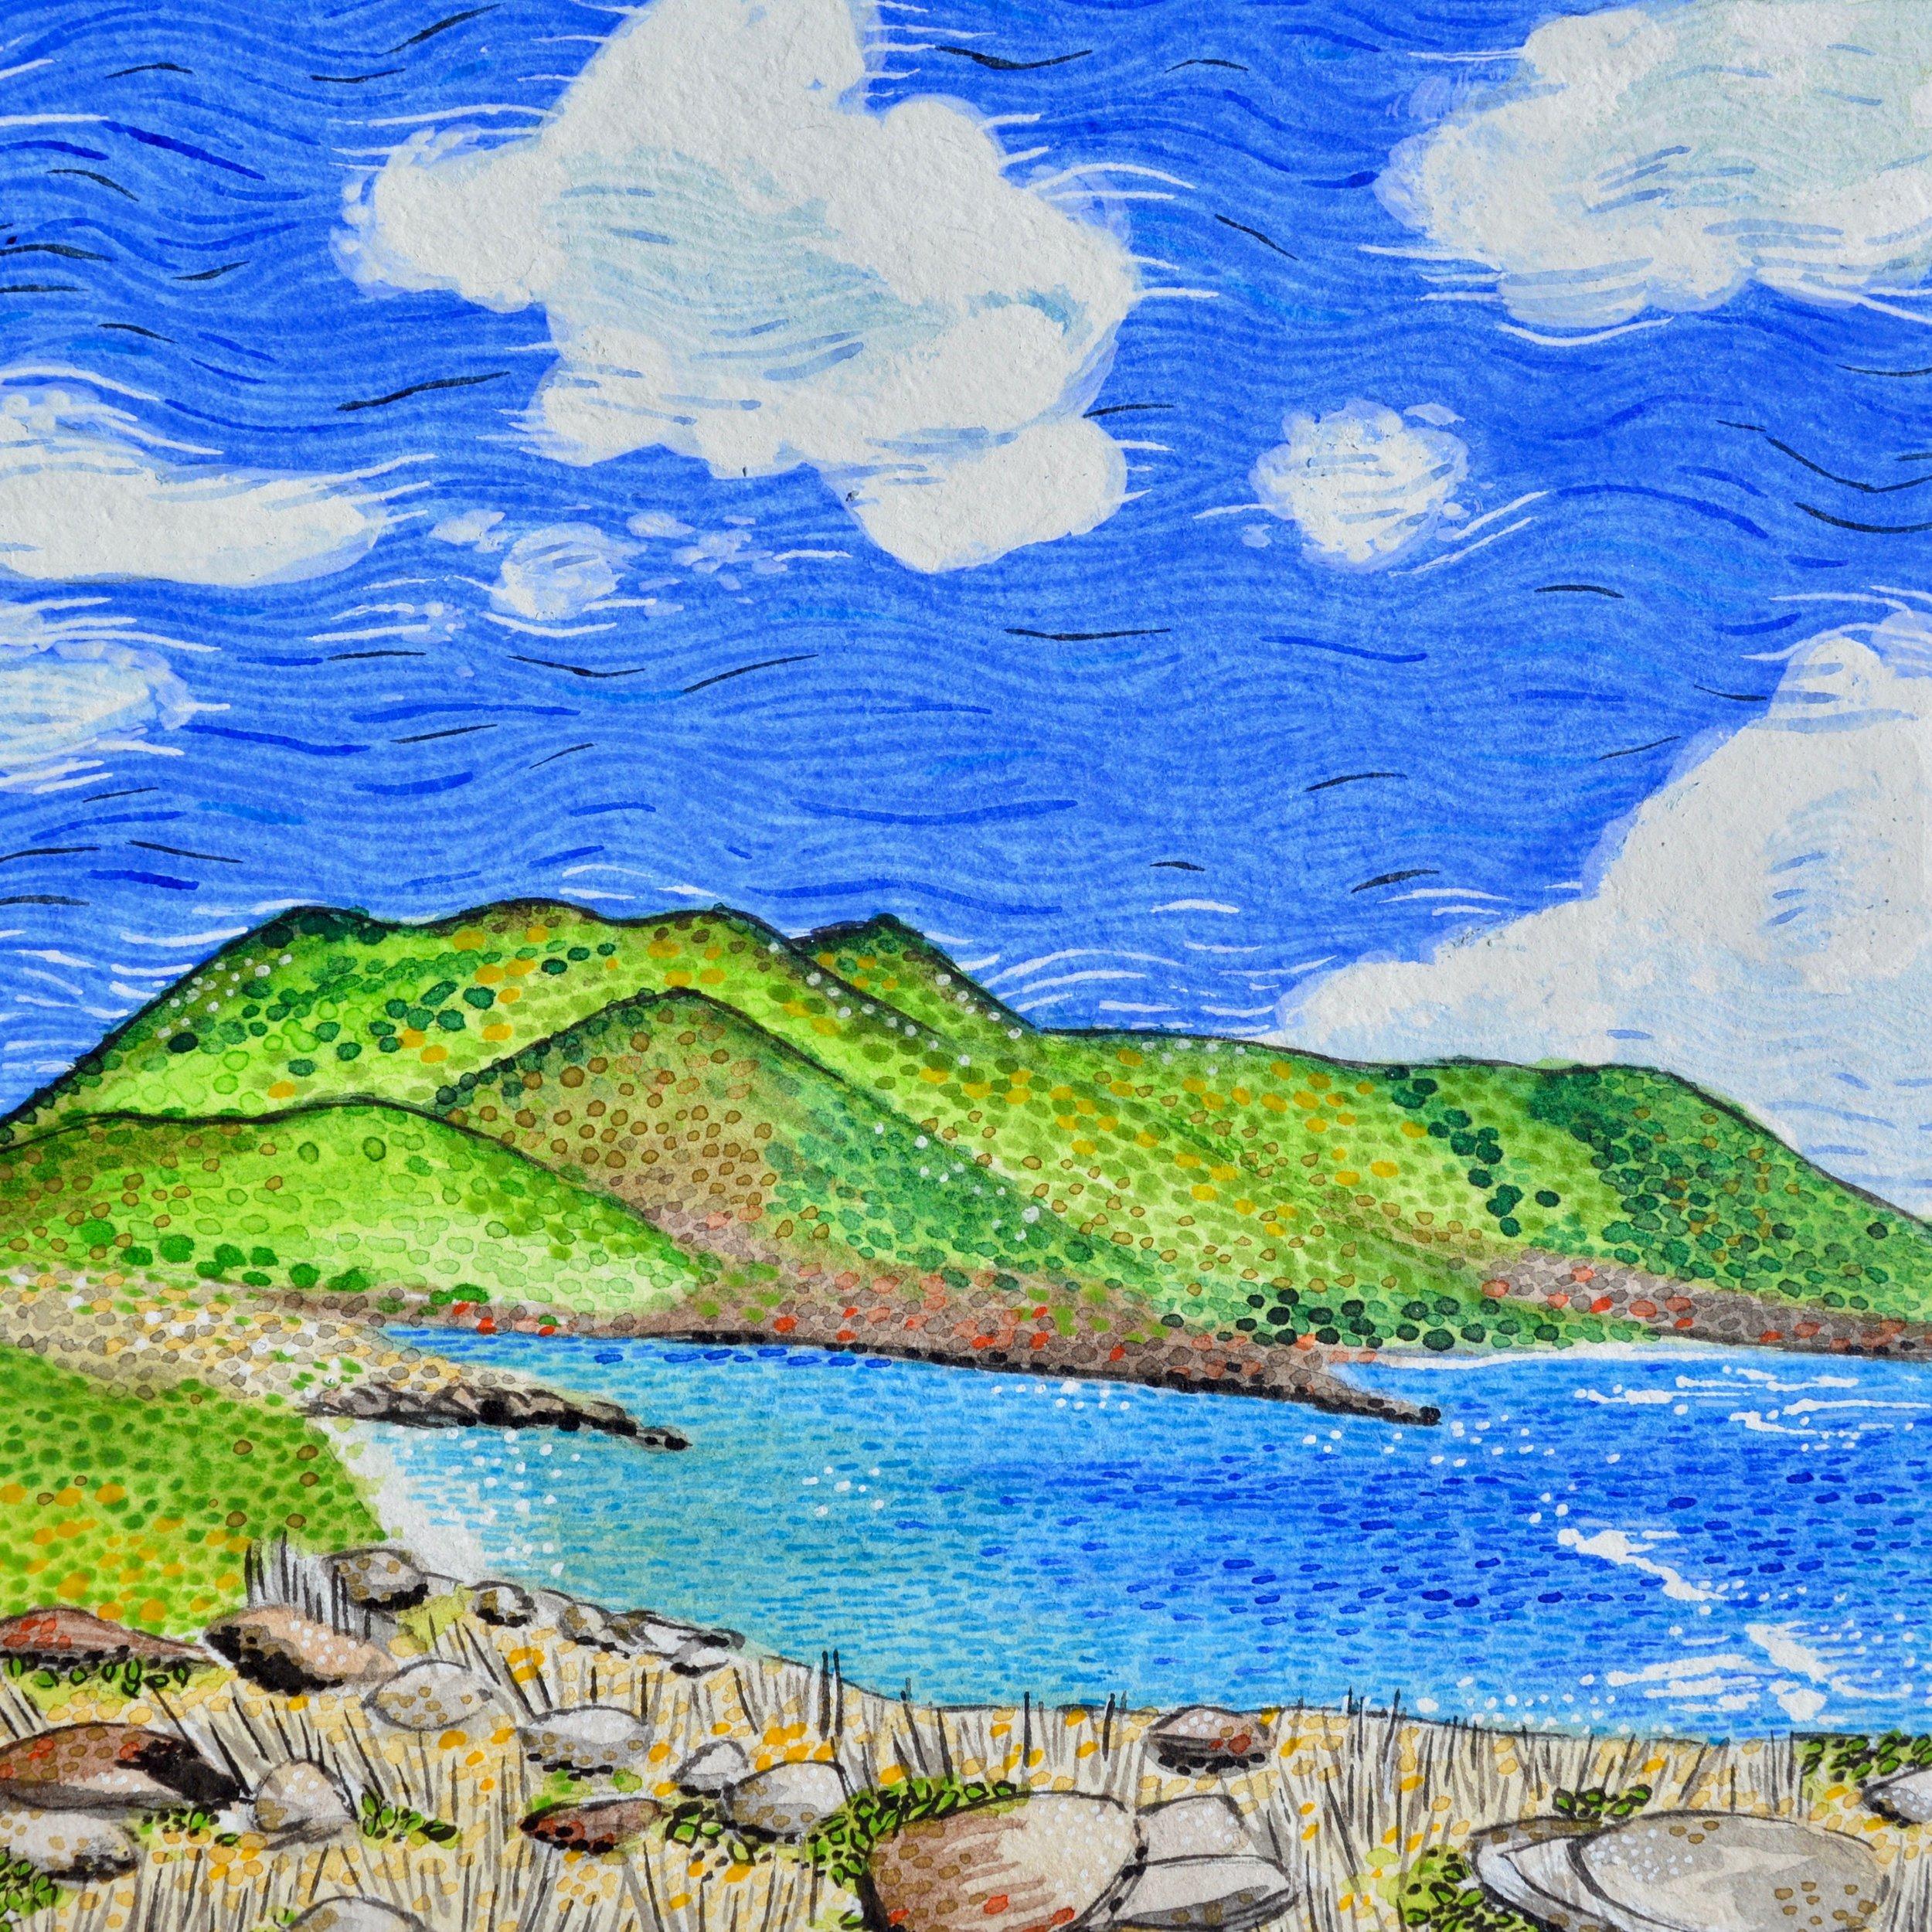 Pinel Island, Saint-Martin, 8/27/17, 11:15:25